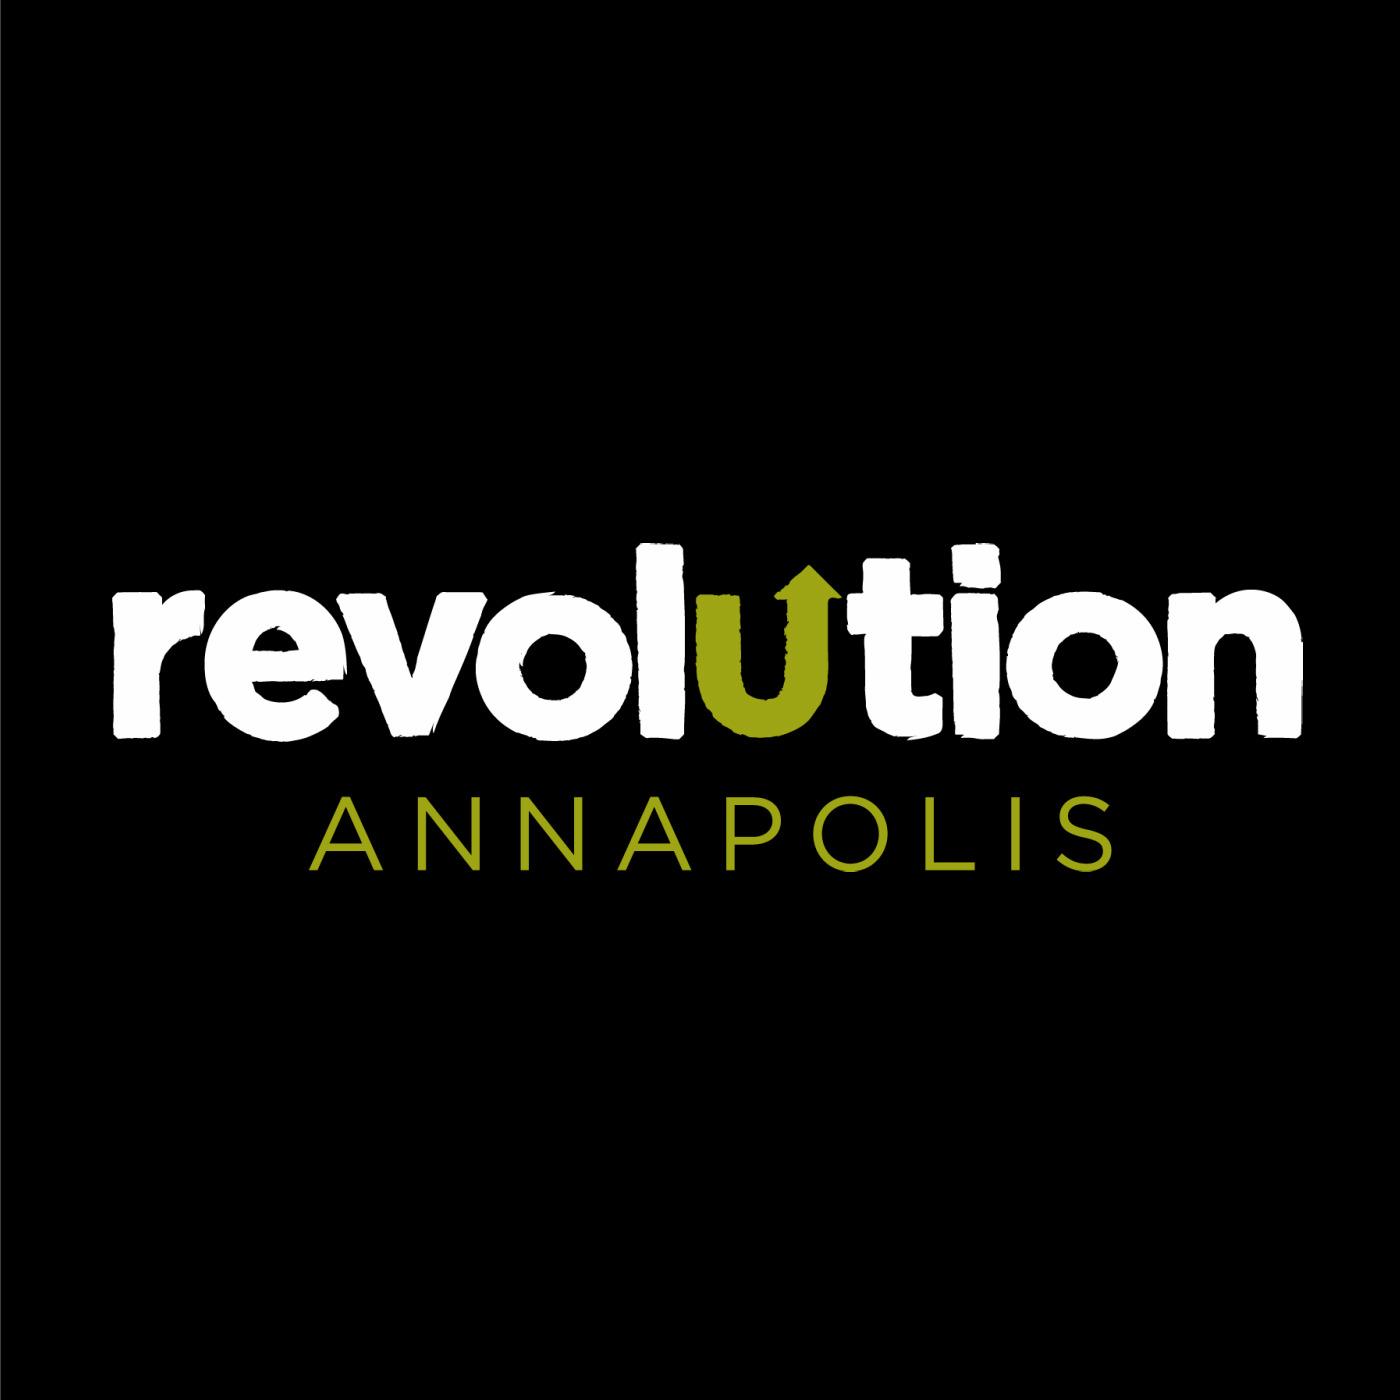 Revolution Annapolis